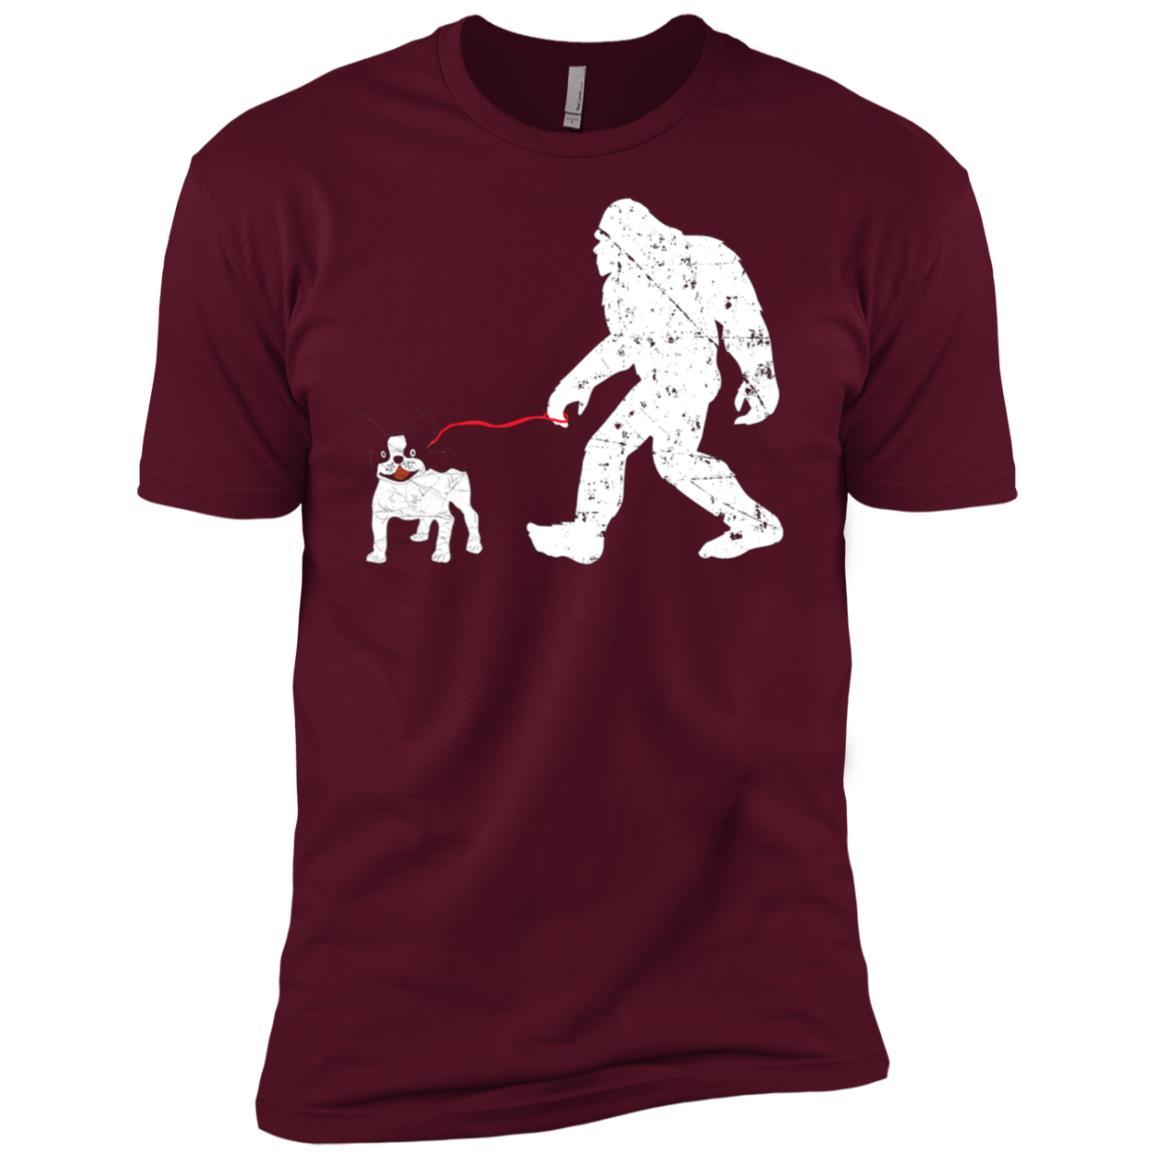 Bigfoot Bigfoot Walking French Bulldog Funny Gift Tee Men Short Sleeve T-Shirt